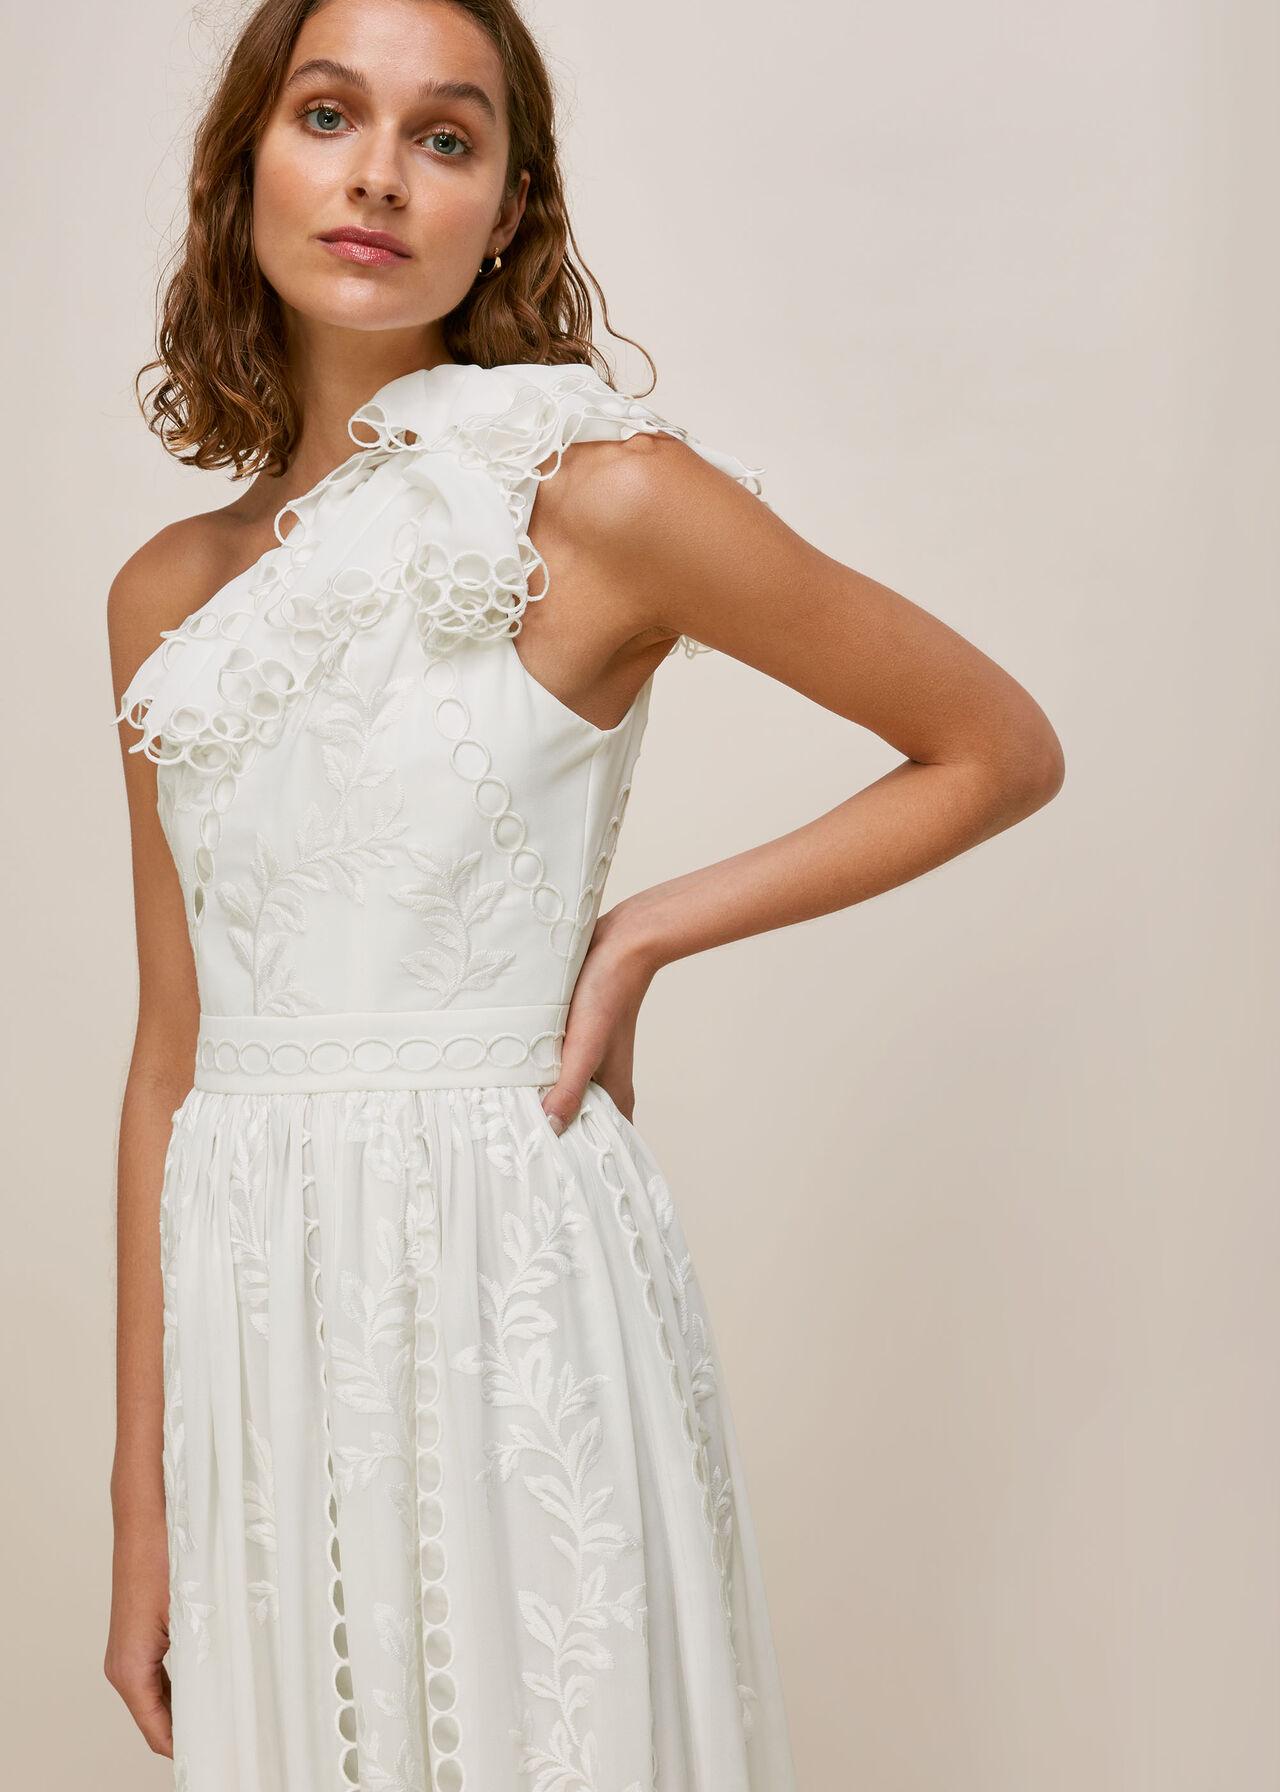 whistles adelaide wedding dress ivory